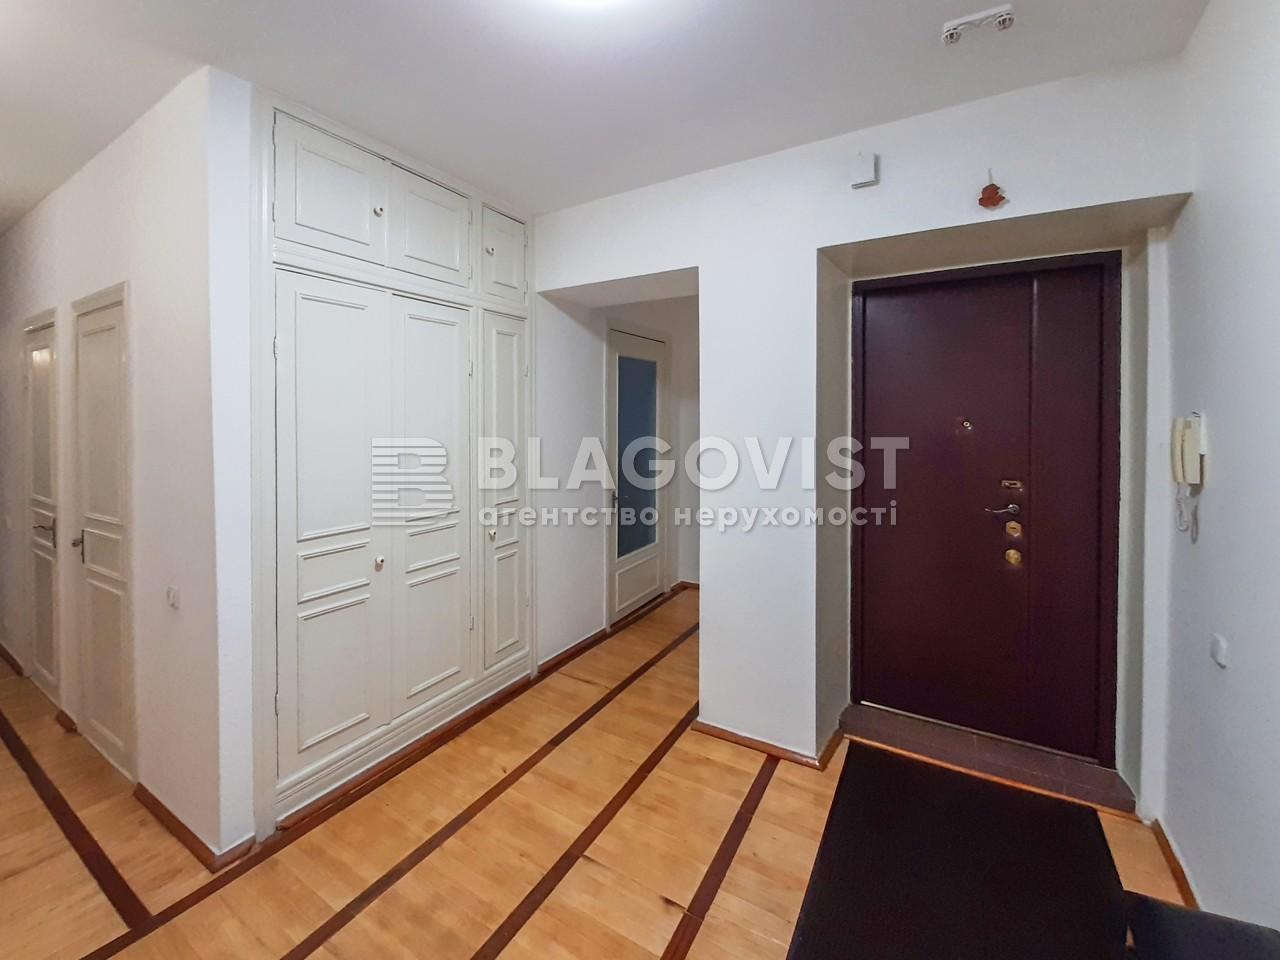 Квартира H-10944, Старонаводницкая, 4б, Киев - Фото 17